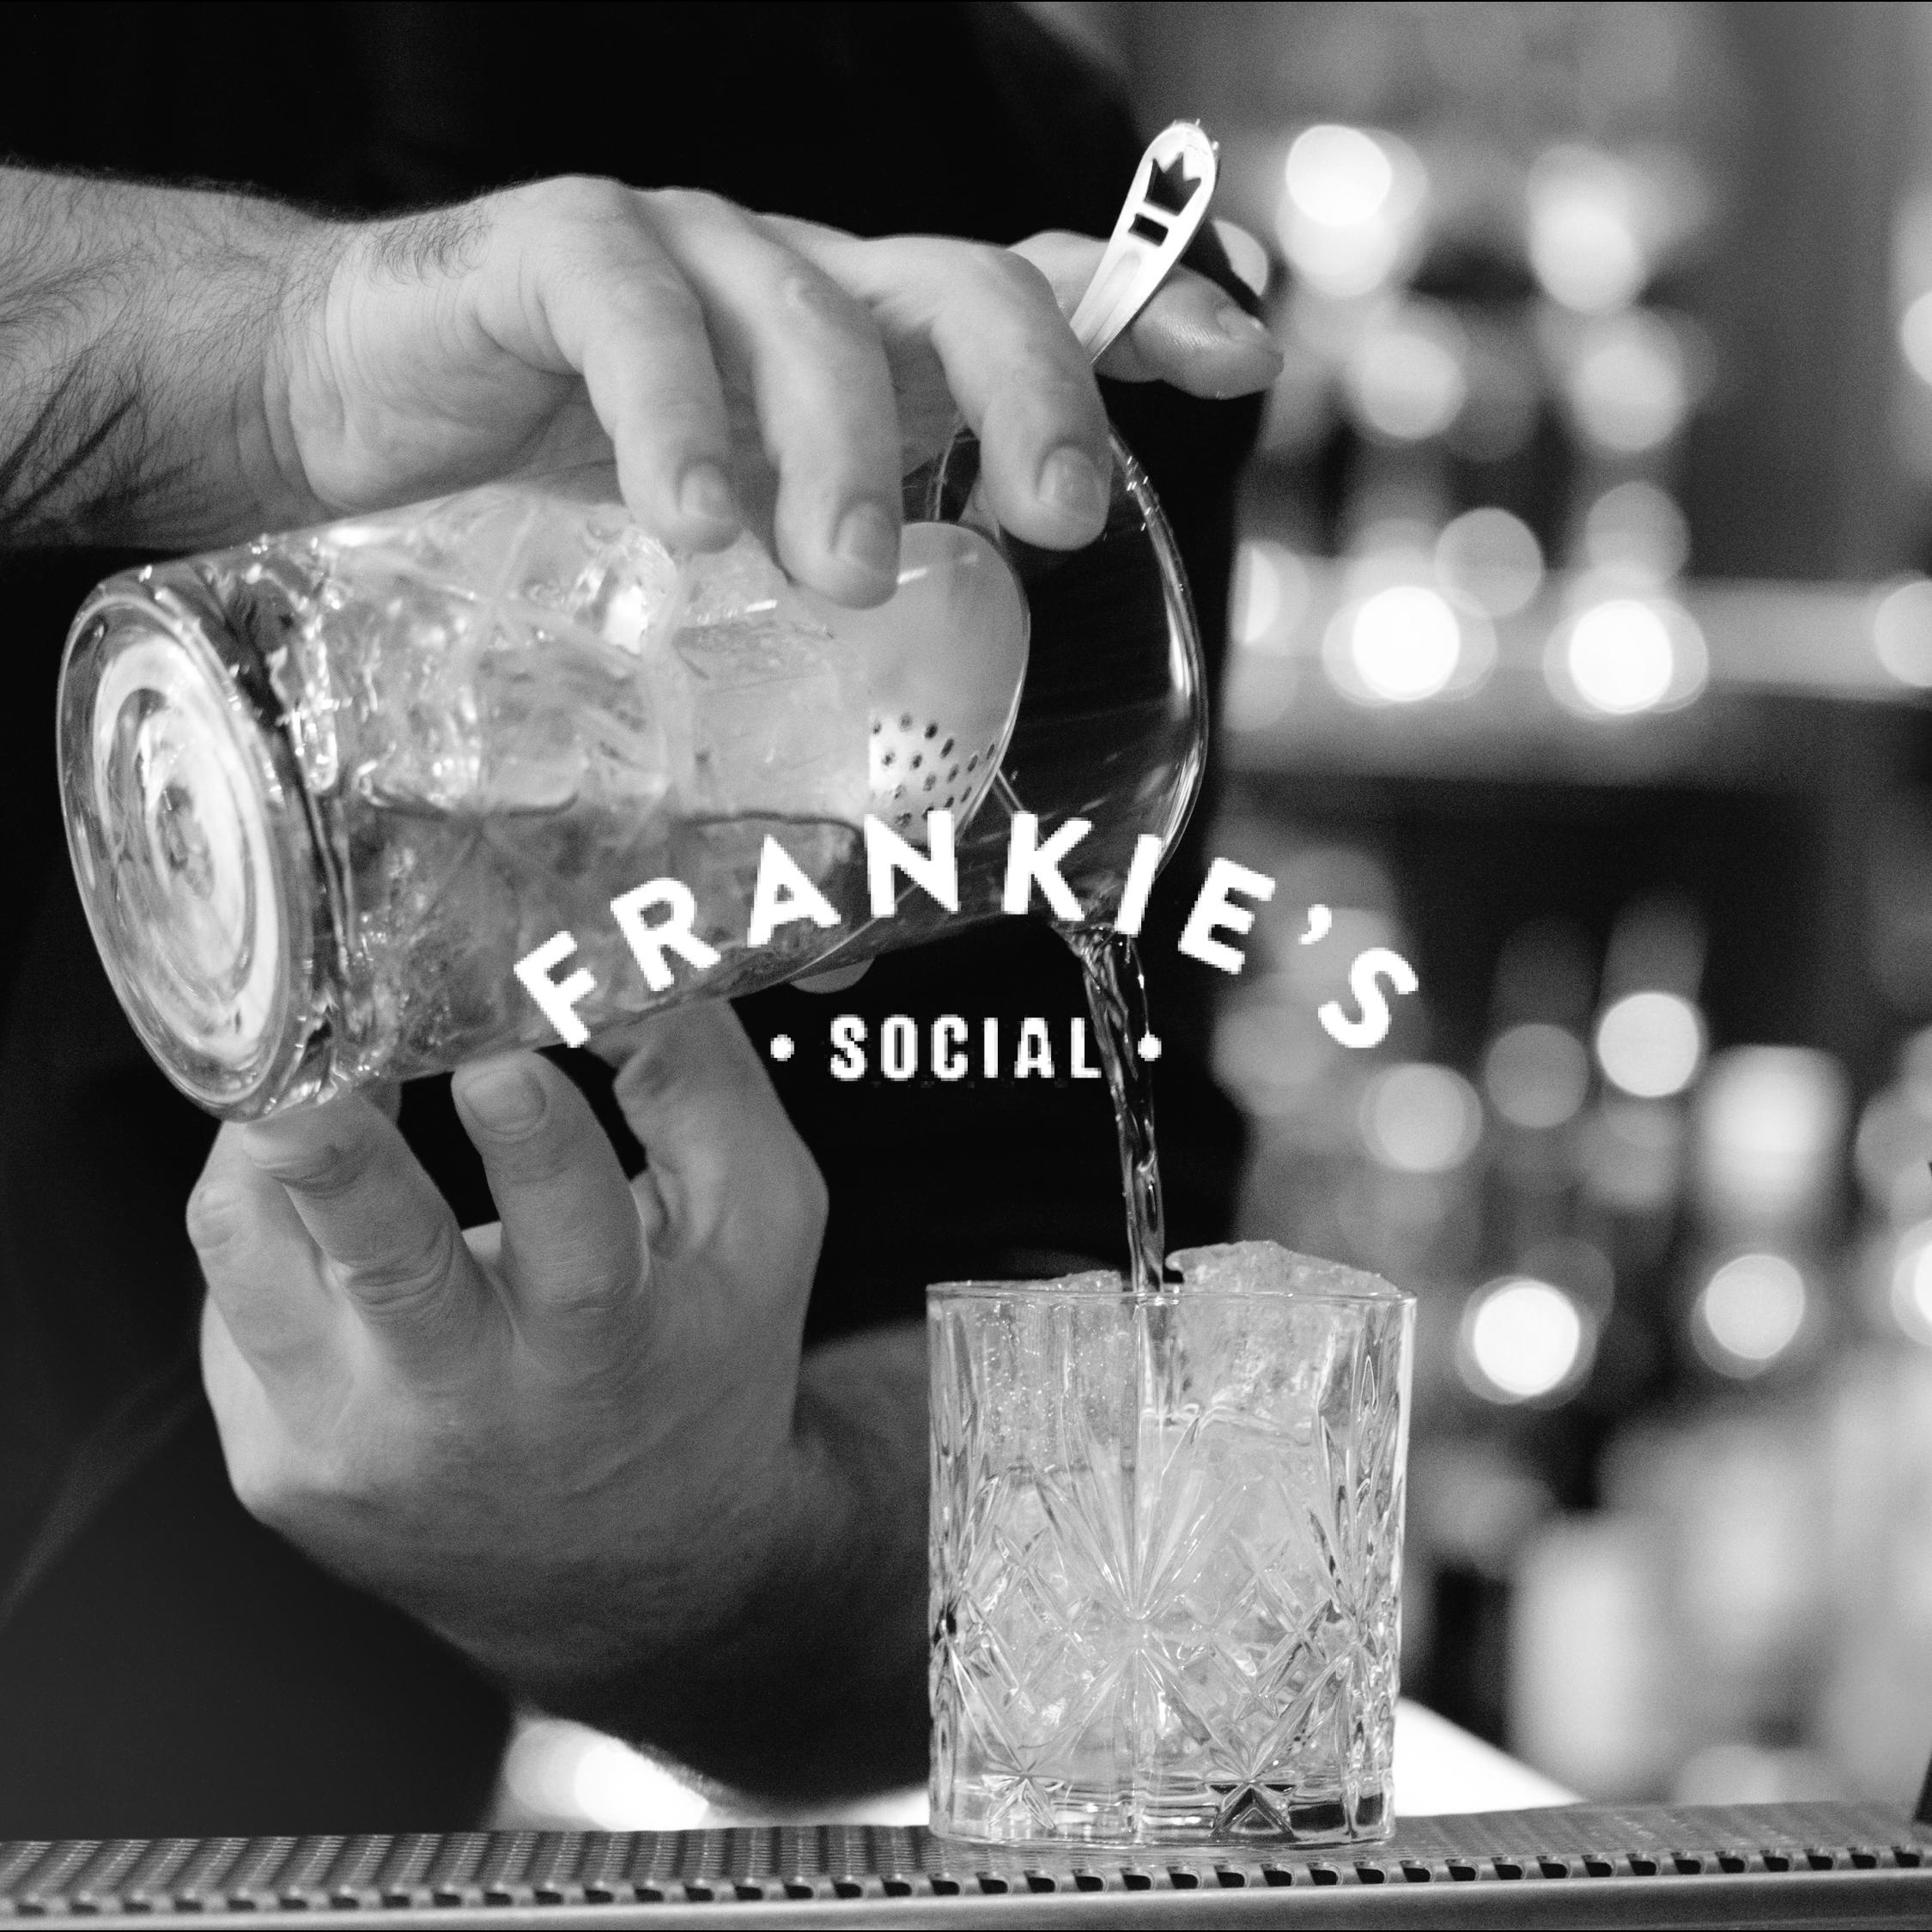 FRANKIE'S SOCIAL